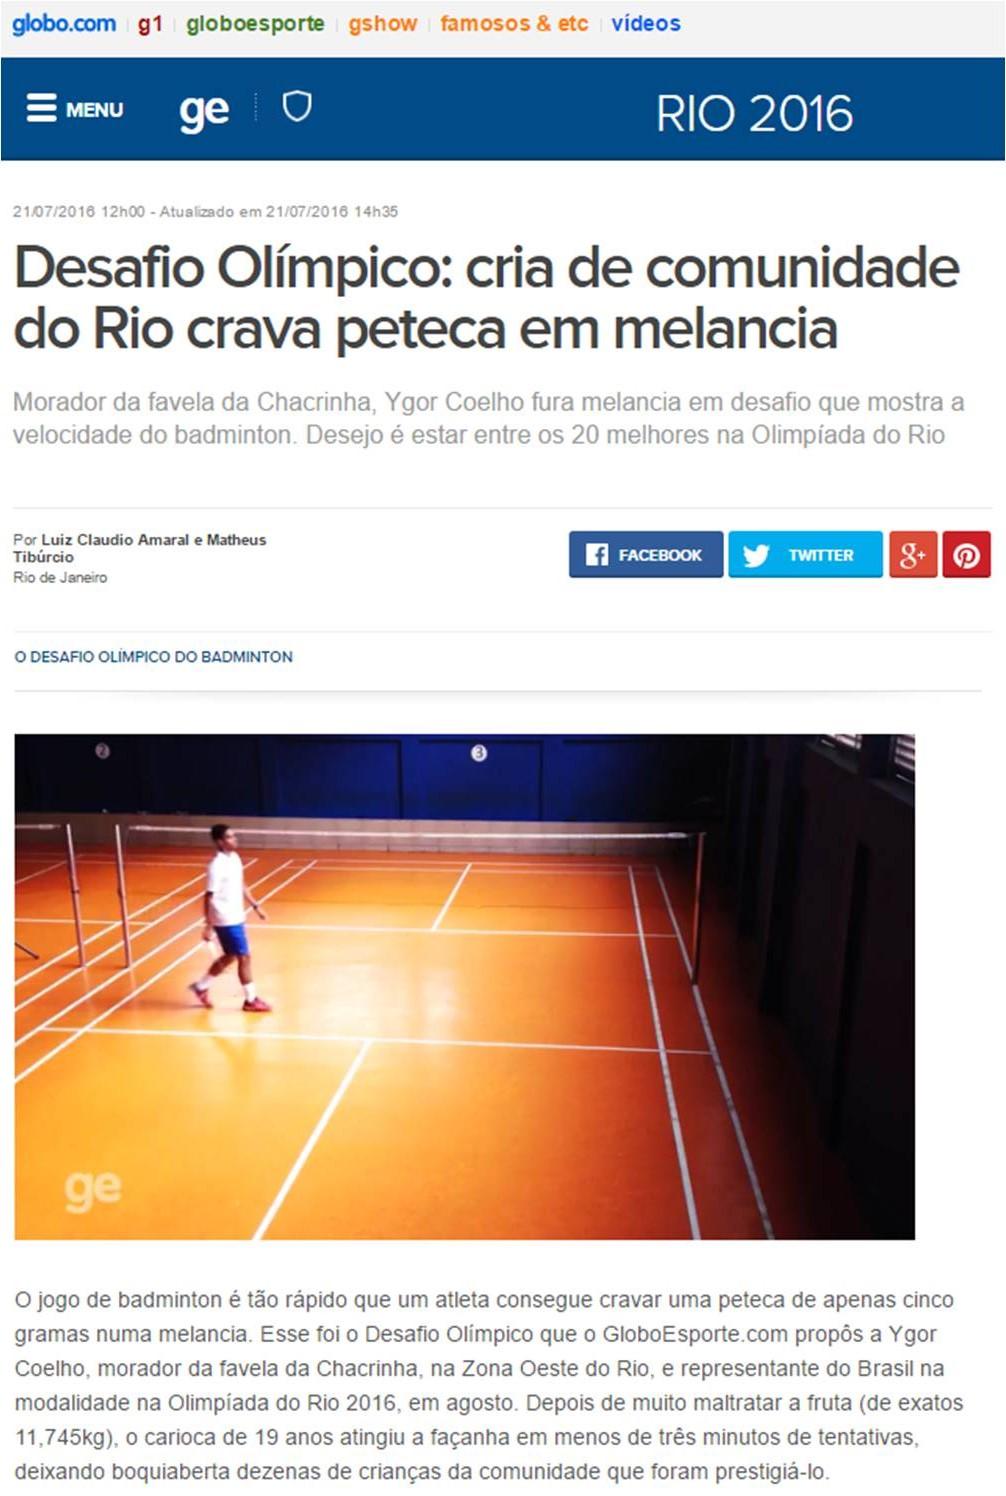 2016 07 21 Globo.com